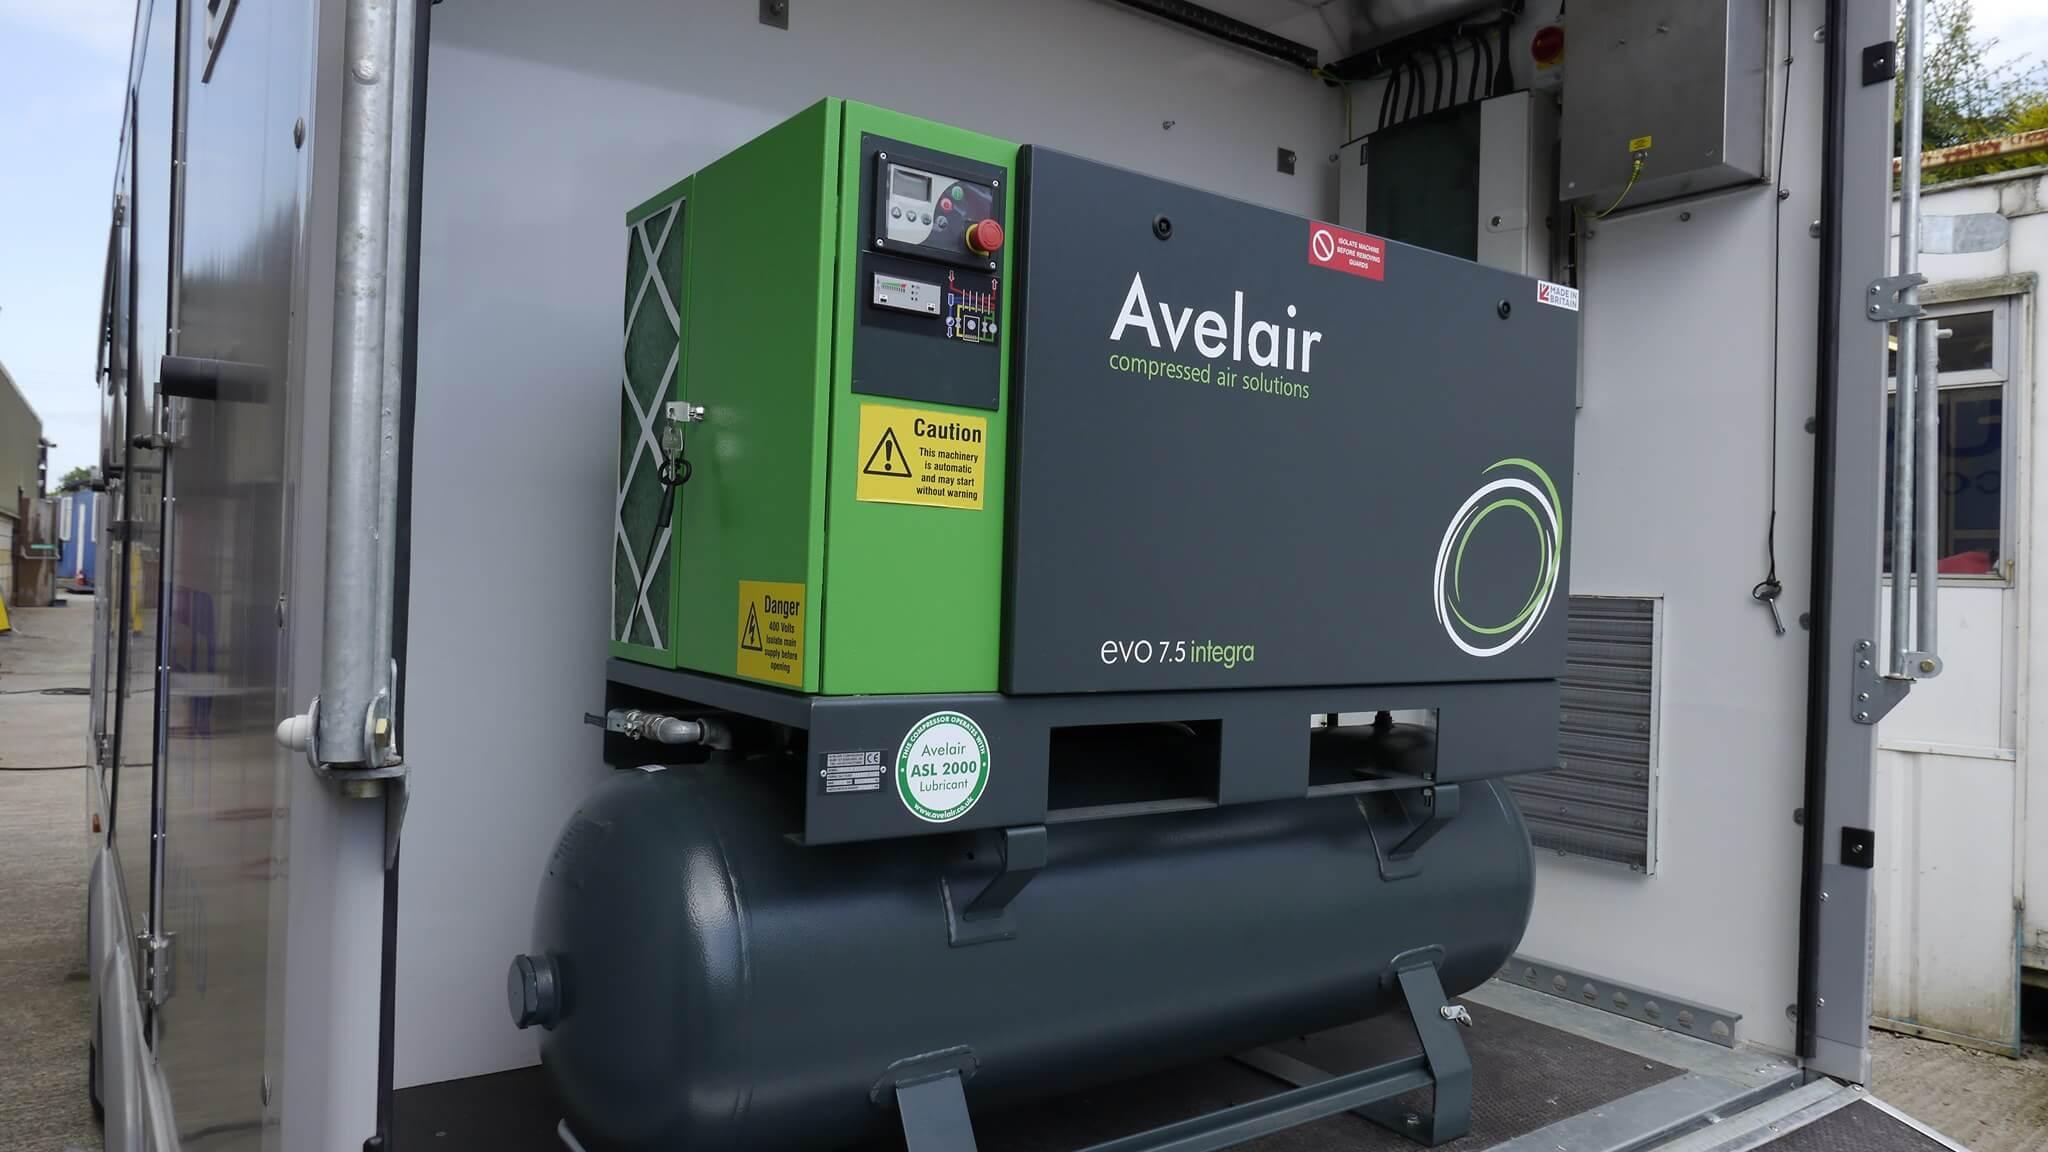 Avelair compressor on dive control trailer